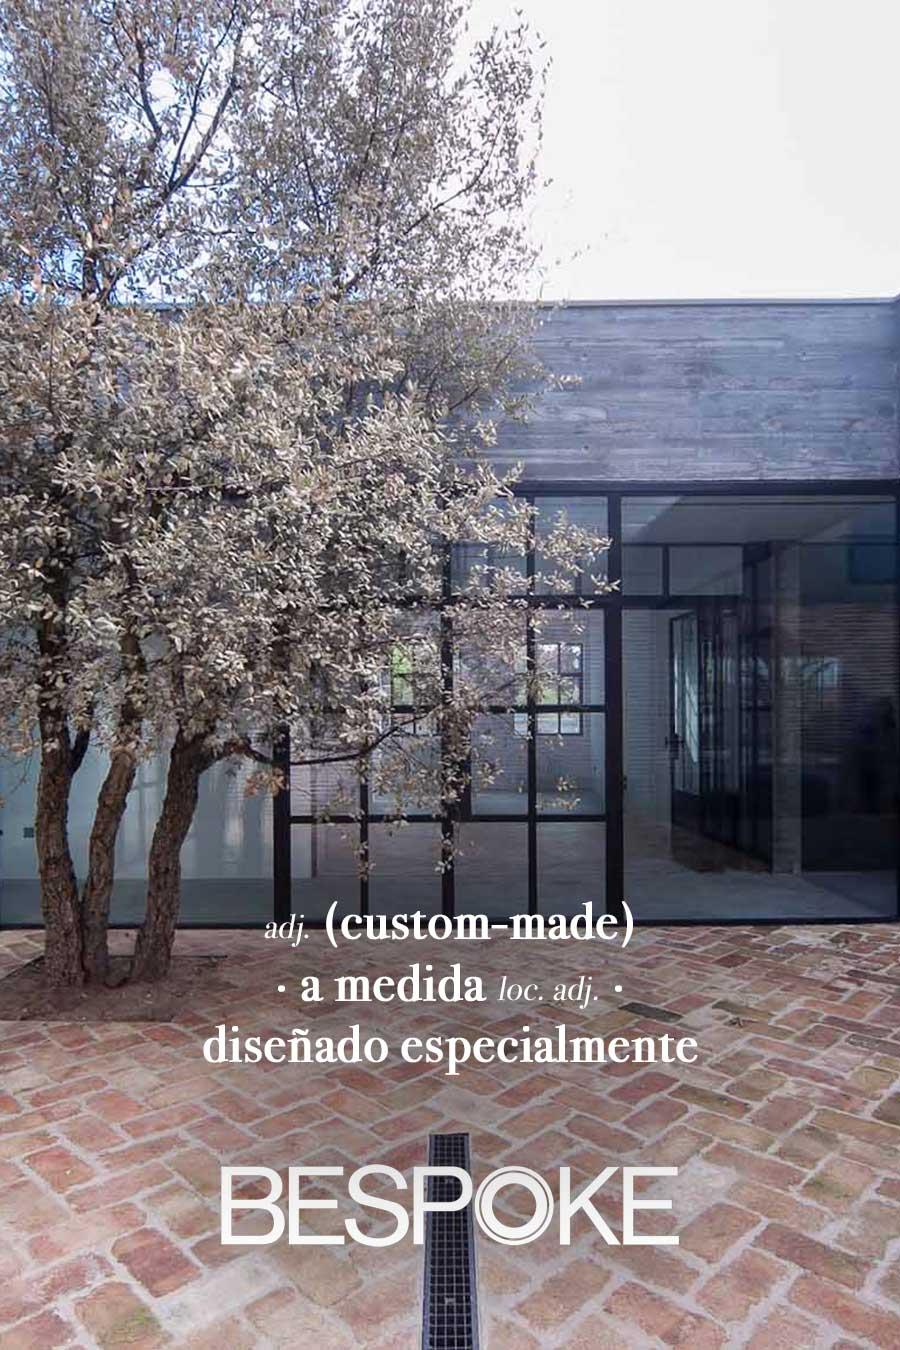 HOME_BESPOKE_CASA PATIO_01_2:3